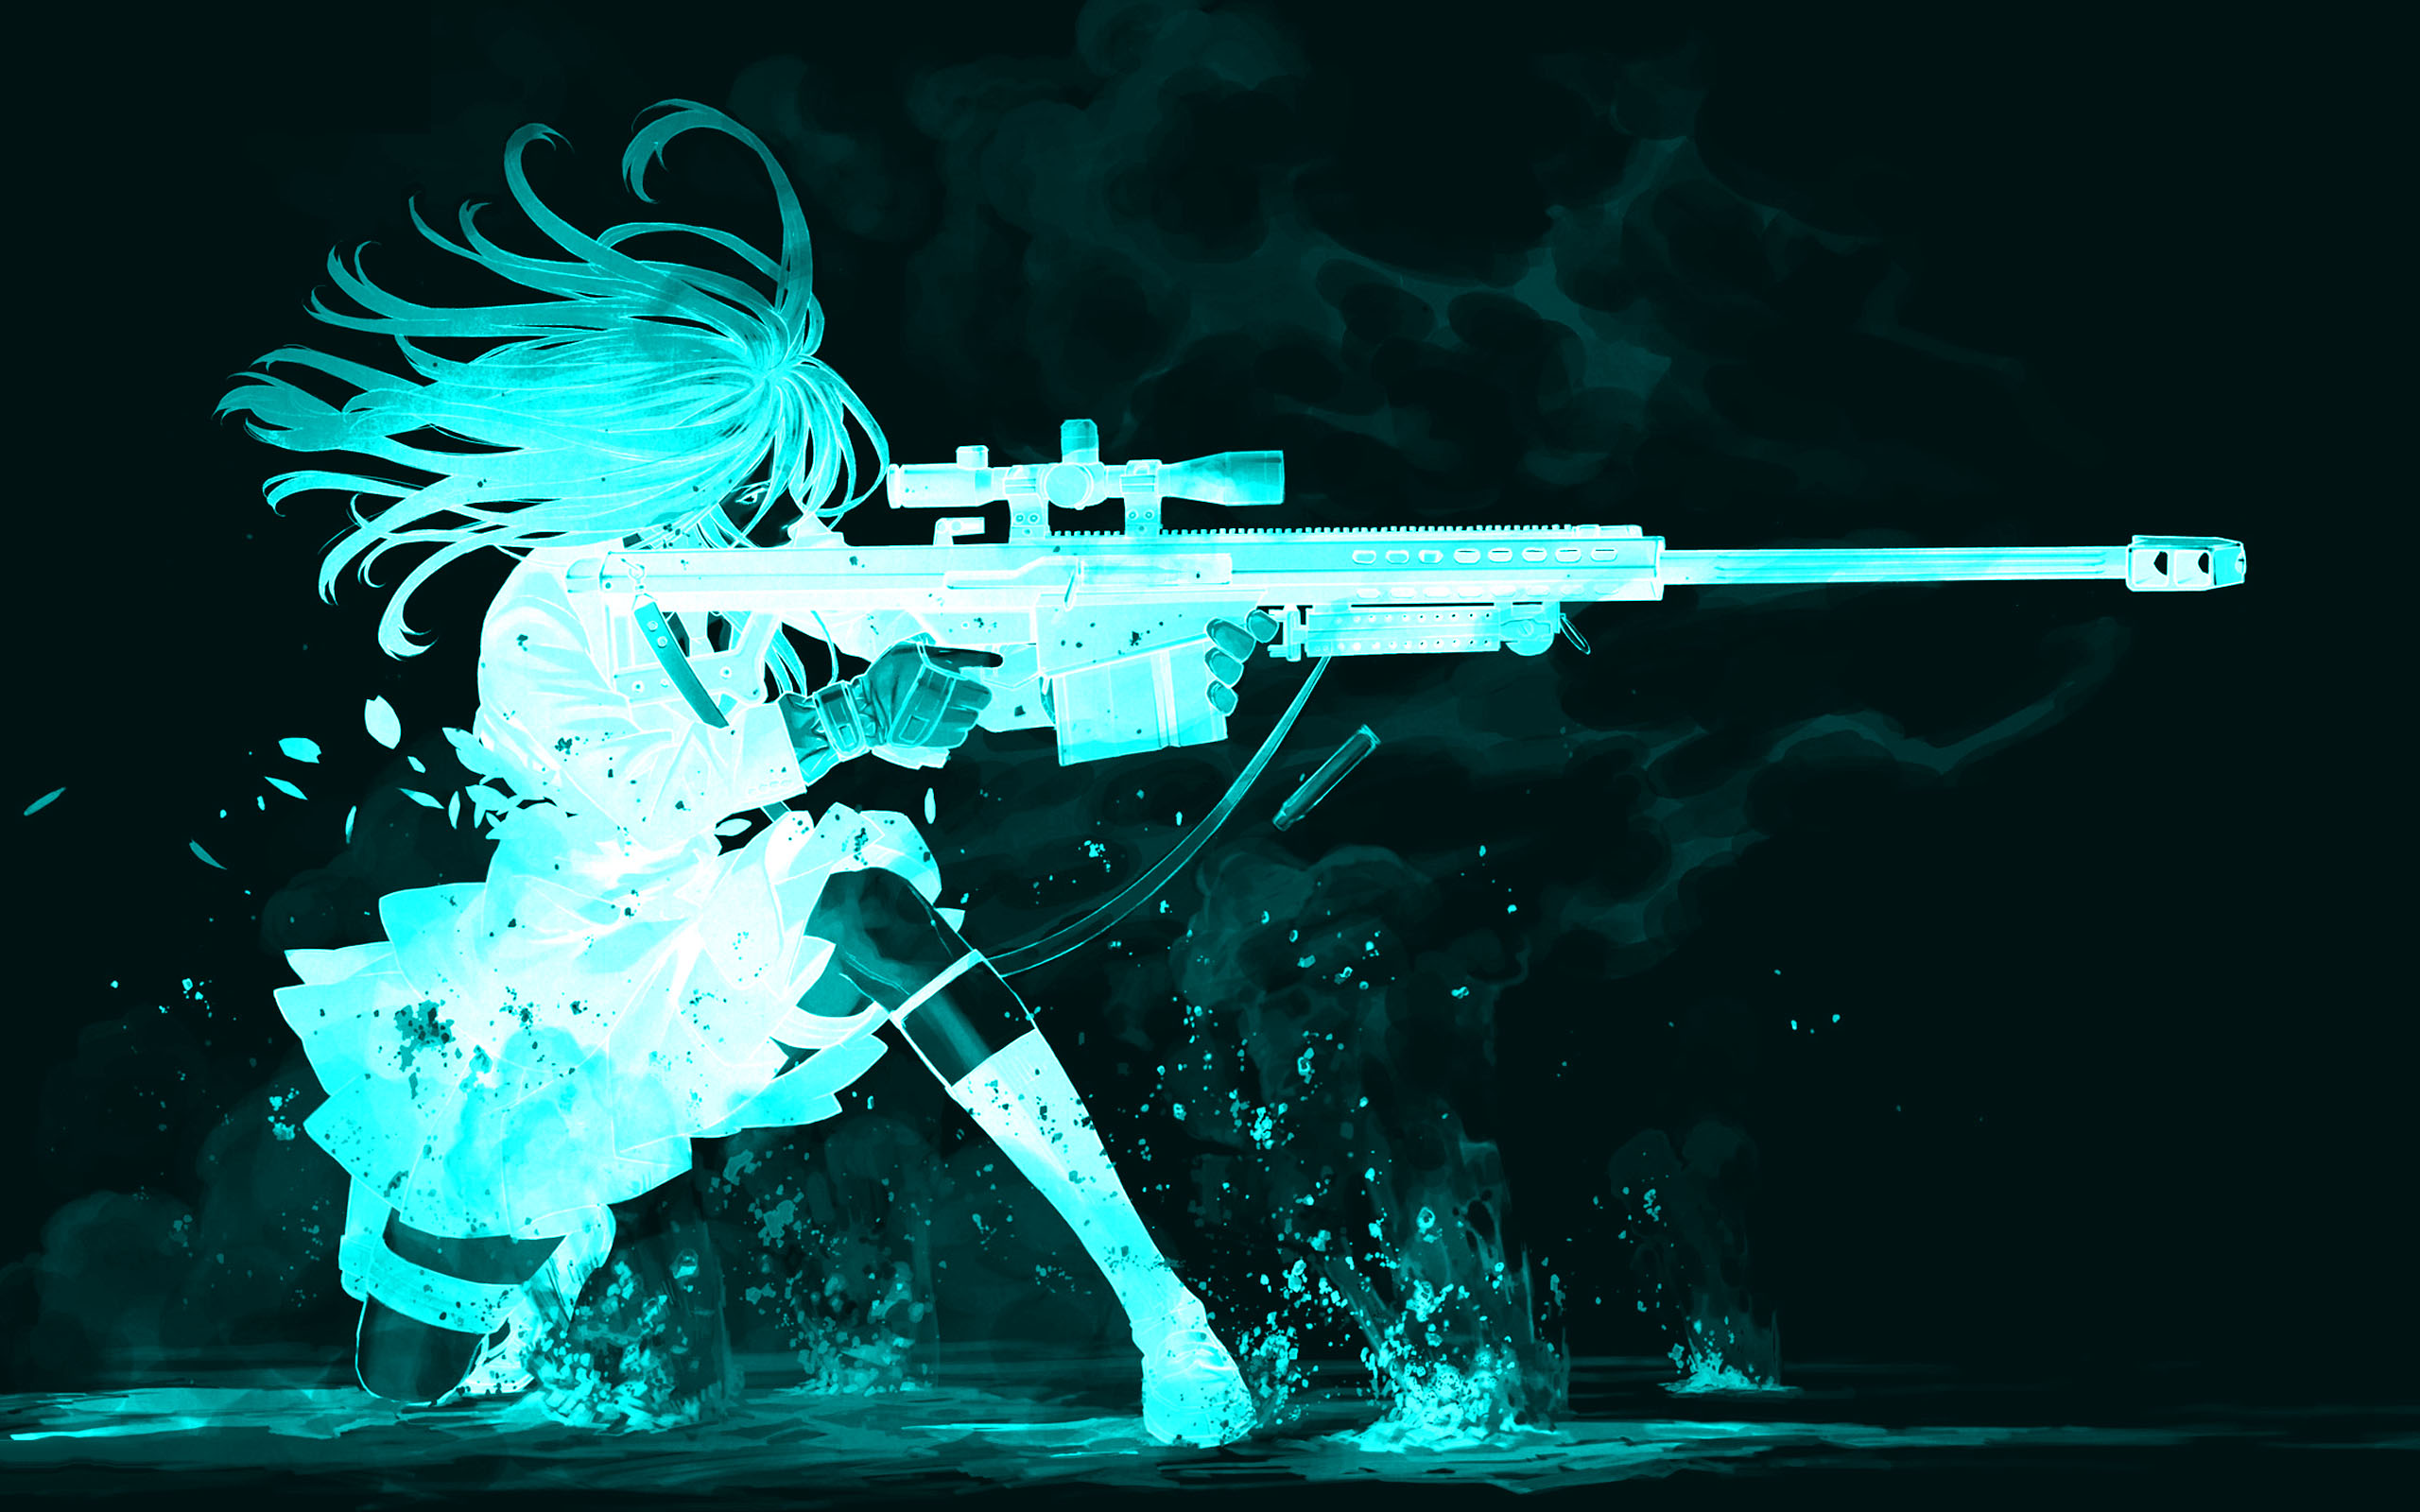 Gun Girl Computer Wallpapers Desktop Backgrounds  2560x1600 ID